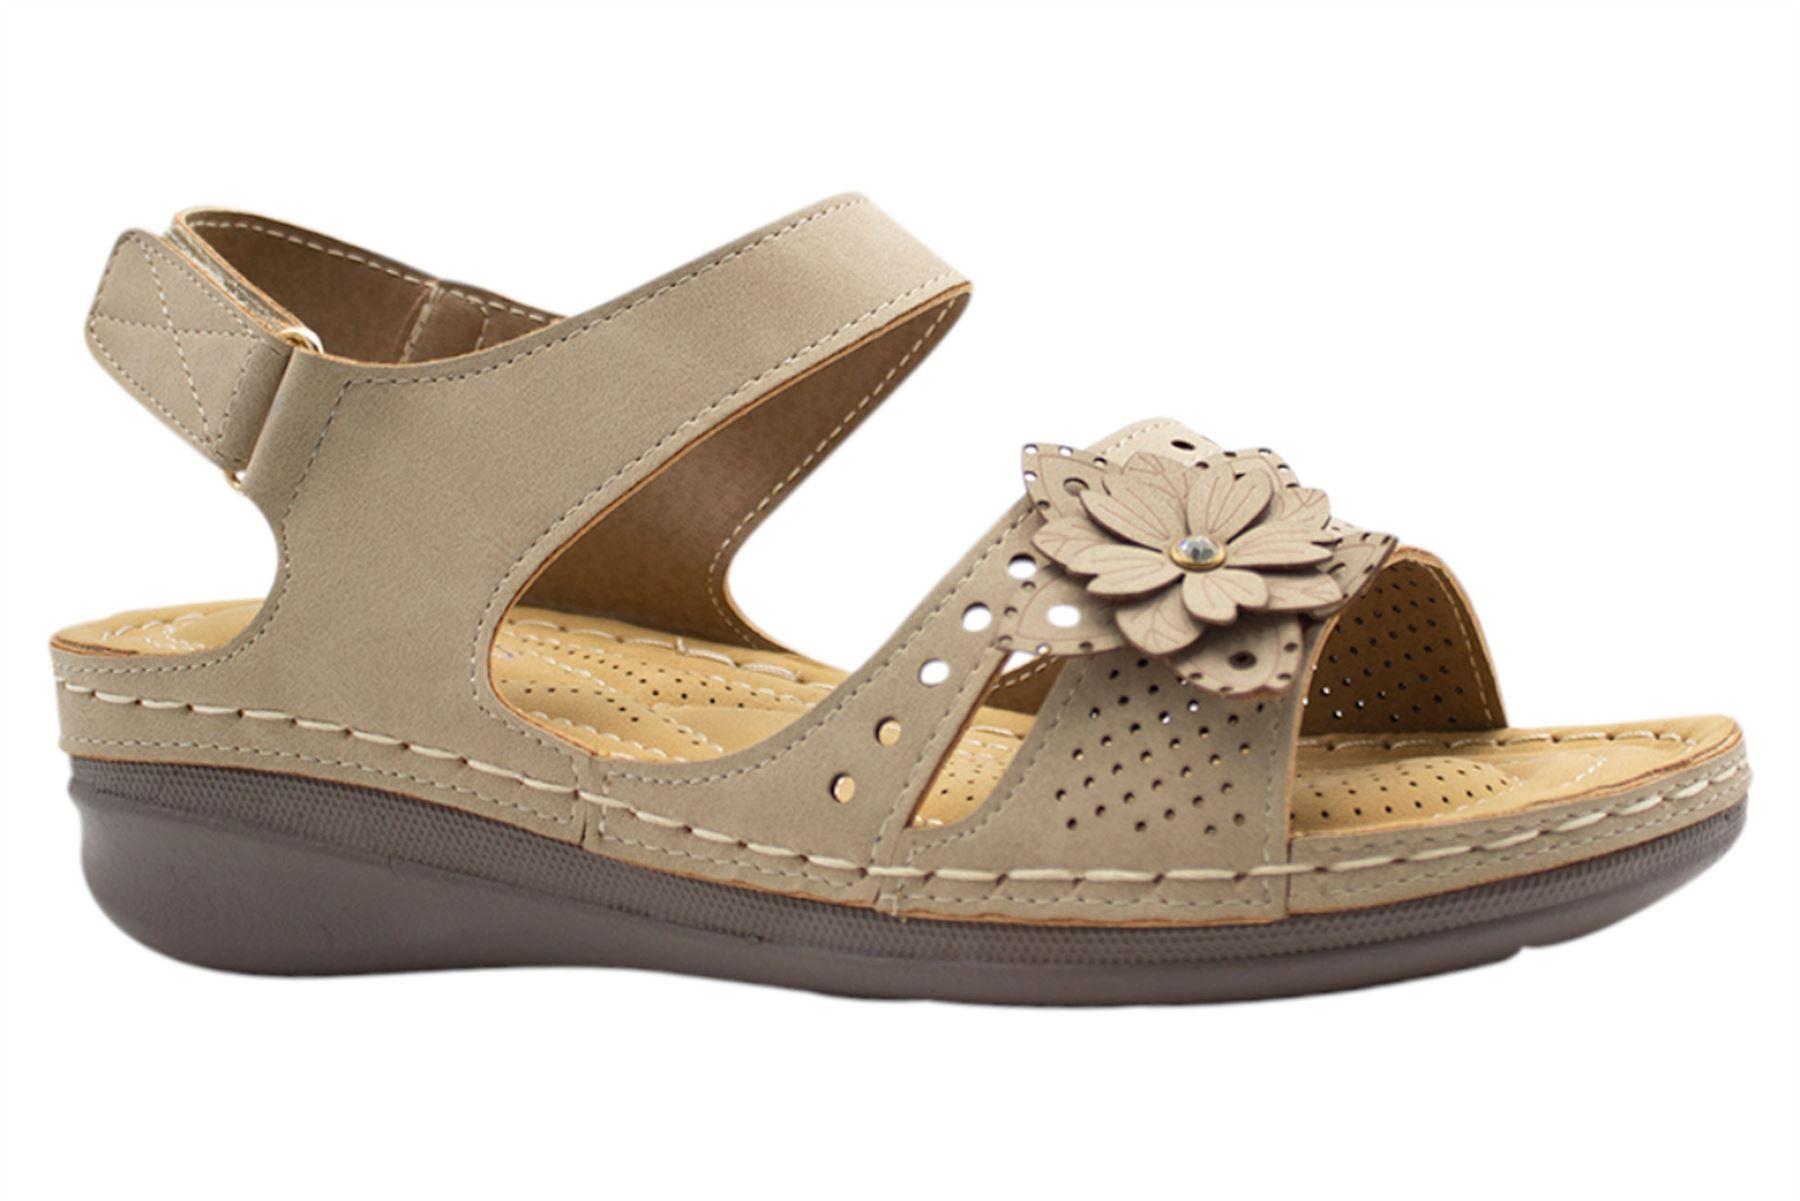 Ladies-Wedge-Heel-Sandal-Womens-Comfort-Cushion-Strapy-Summer-Shoes miniatura 5